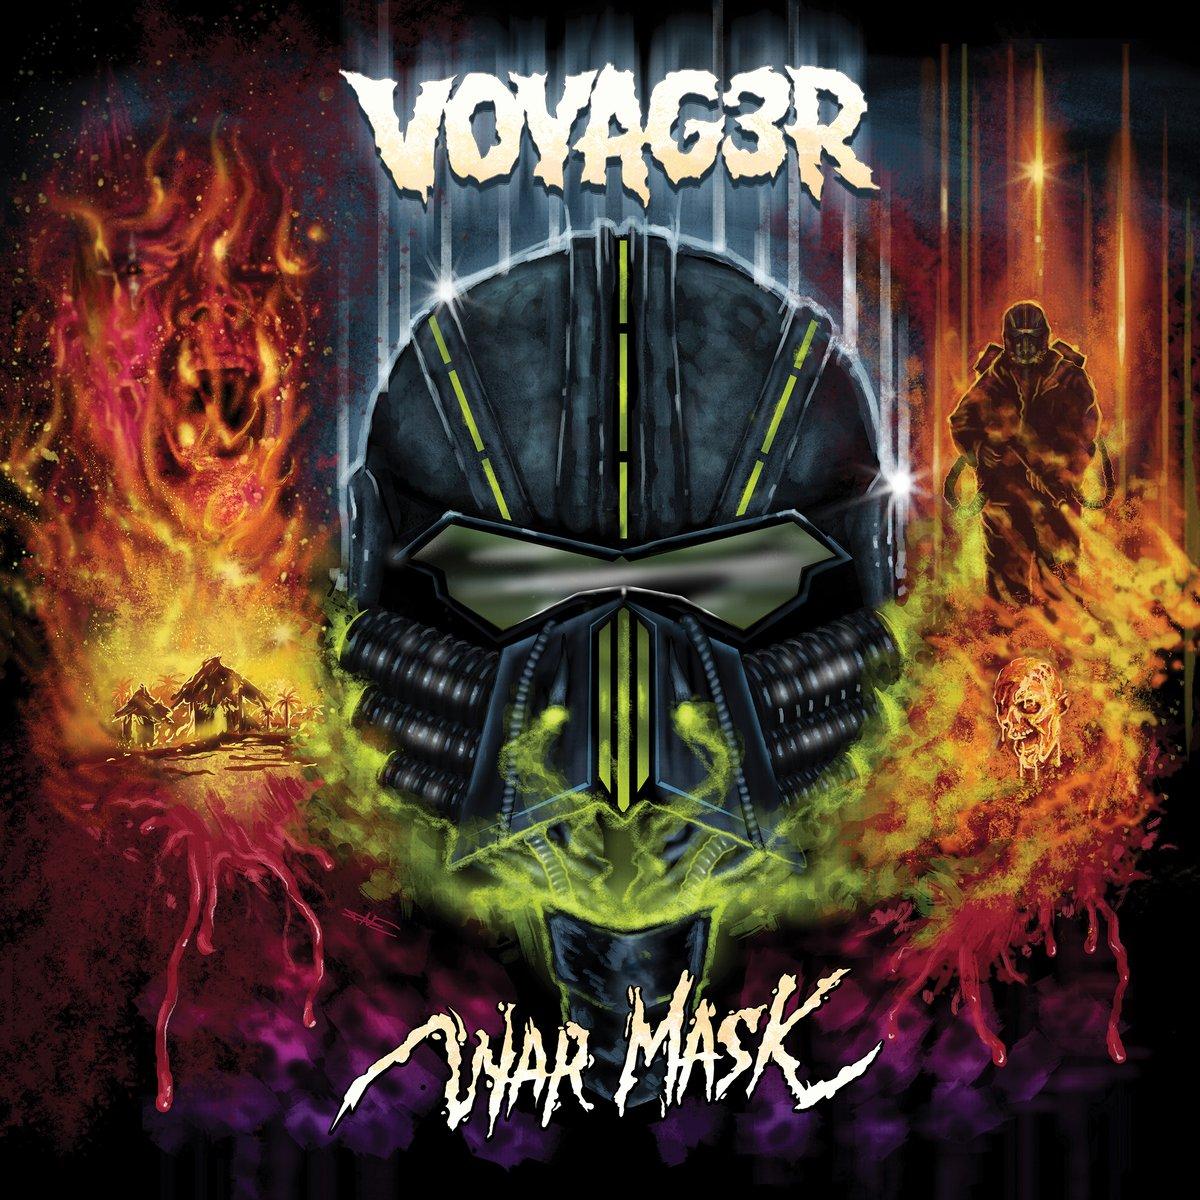 Image of Voyag3r - War Mask - LP + Download Code + 3-D Art Print w/Mask